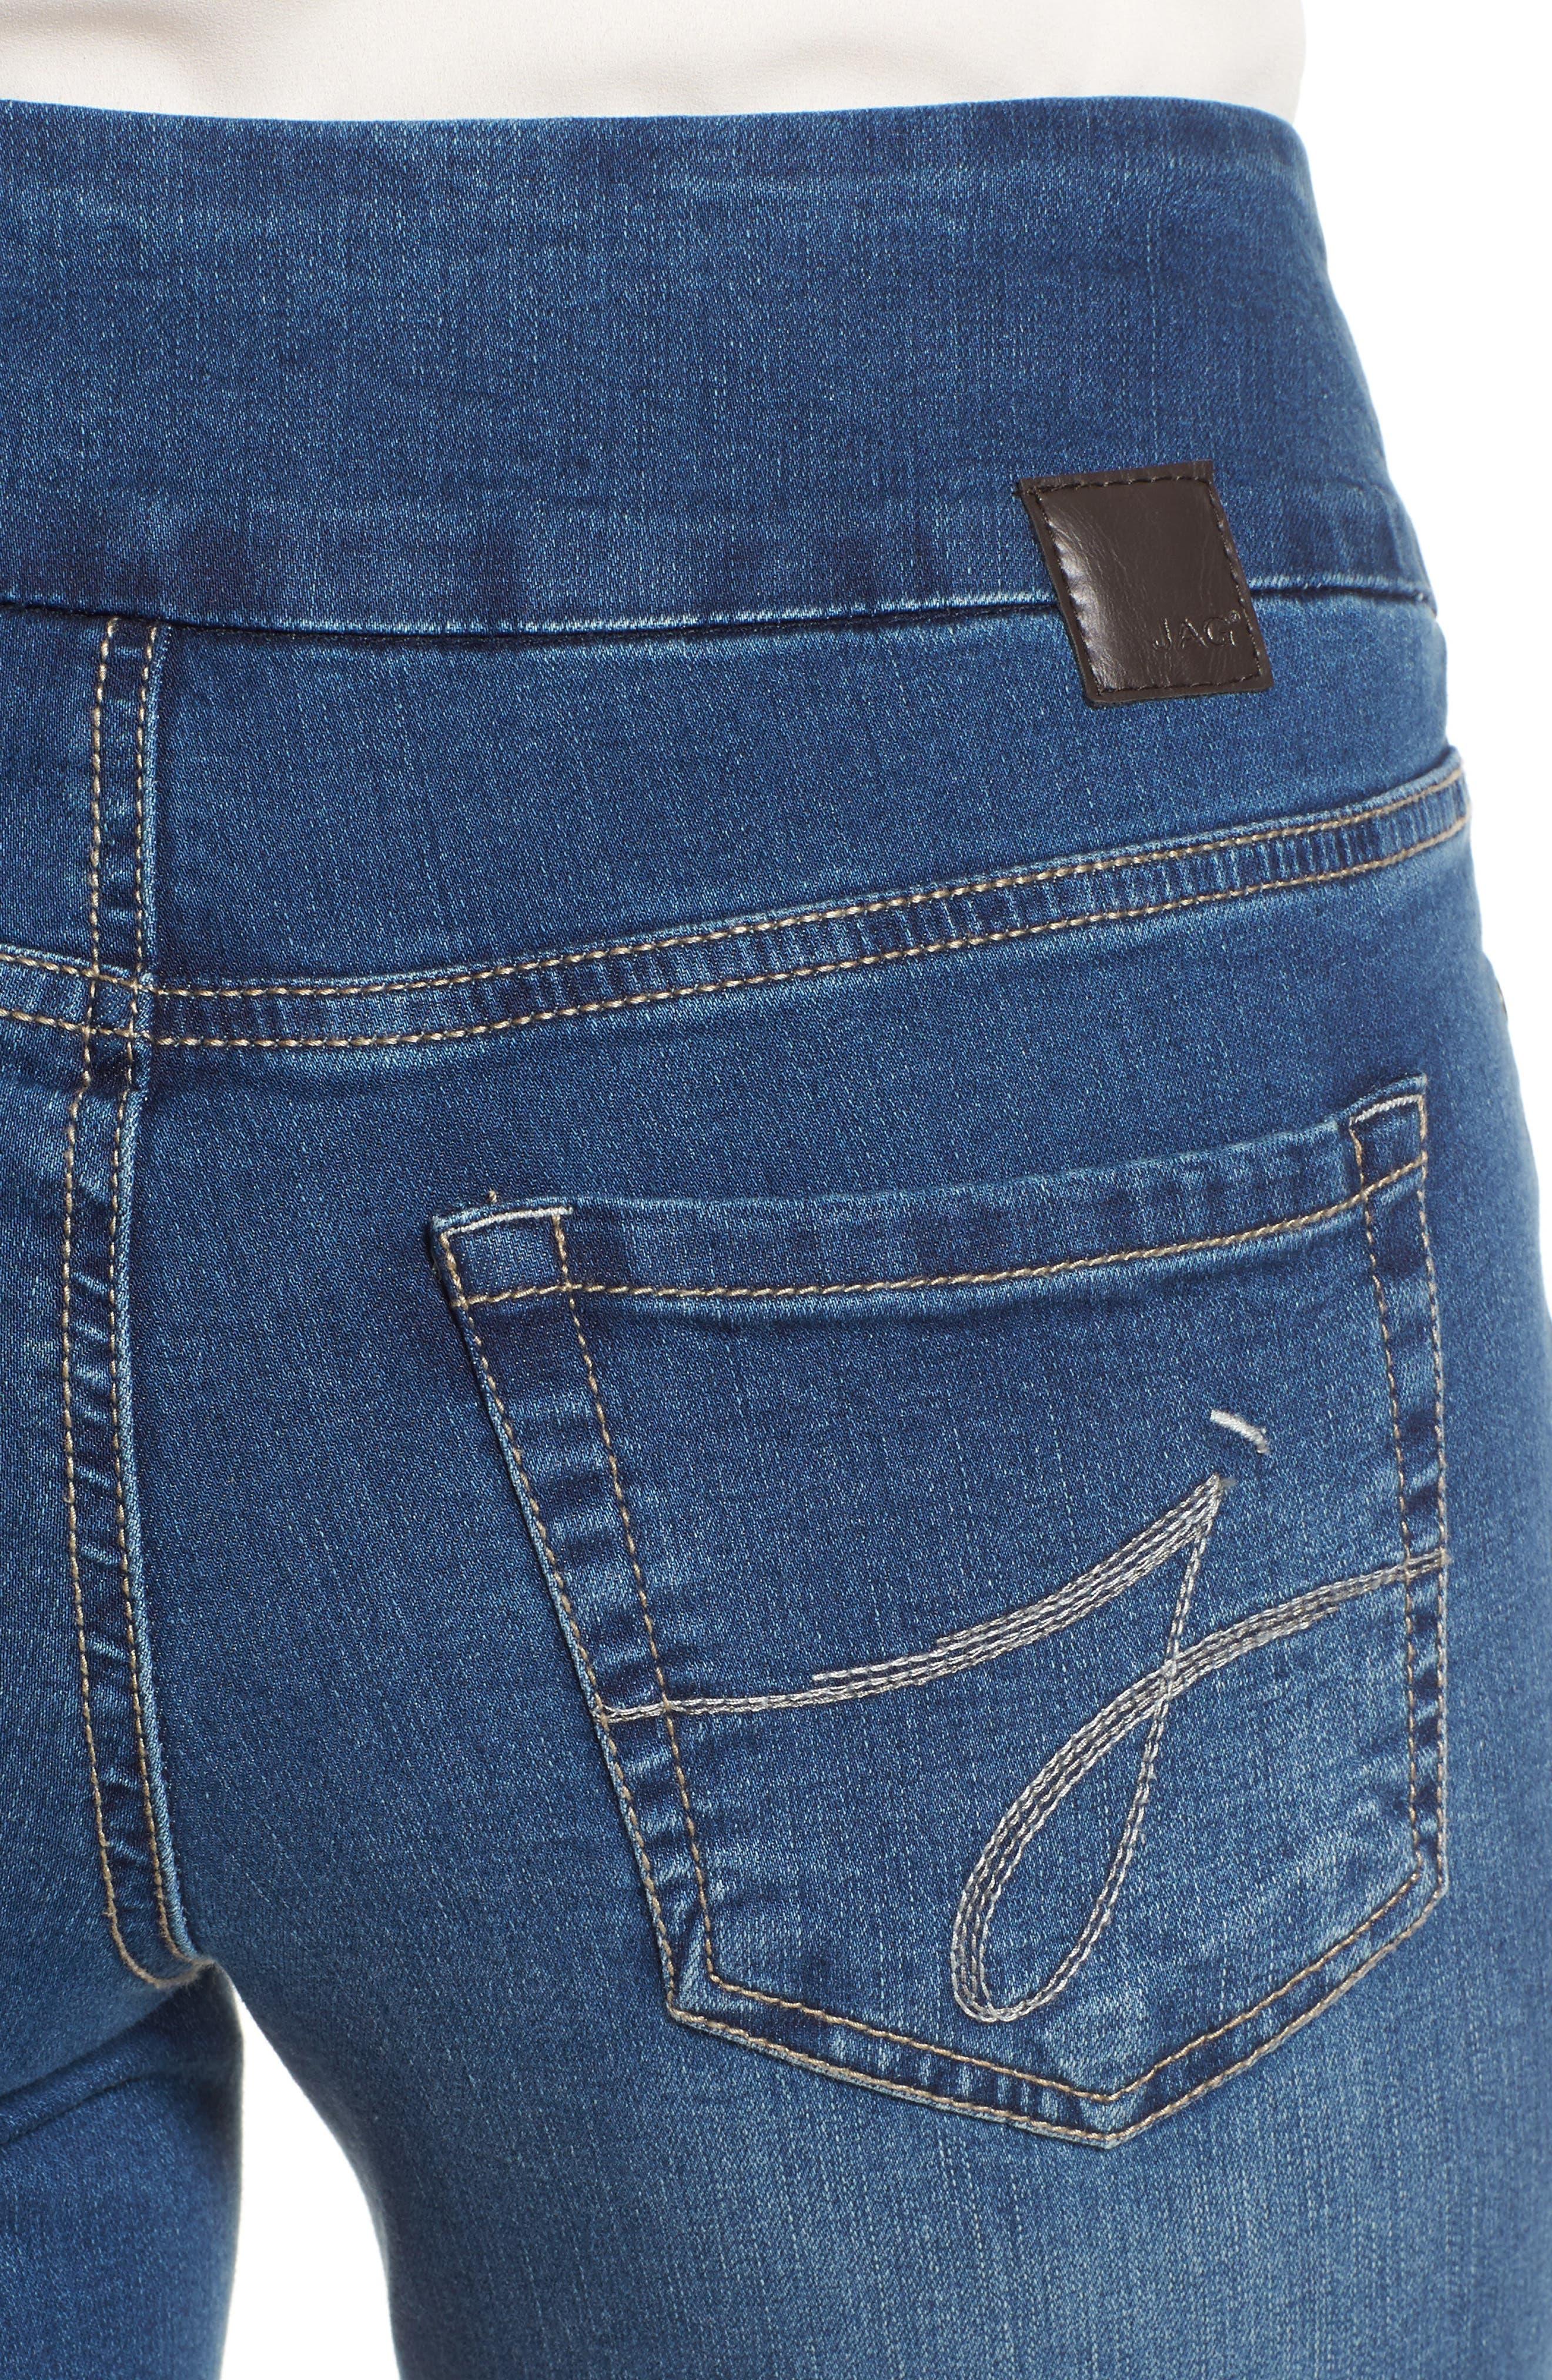 Peri Pull-On Straight Leg Jeans,                             Alternate thumbnail 4, color,                             MEDIUM INDIGO